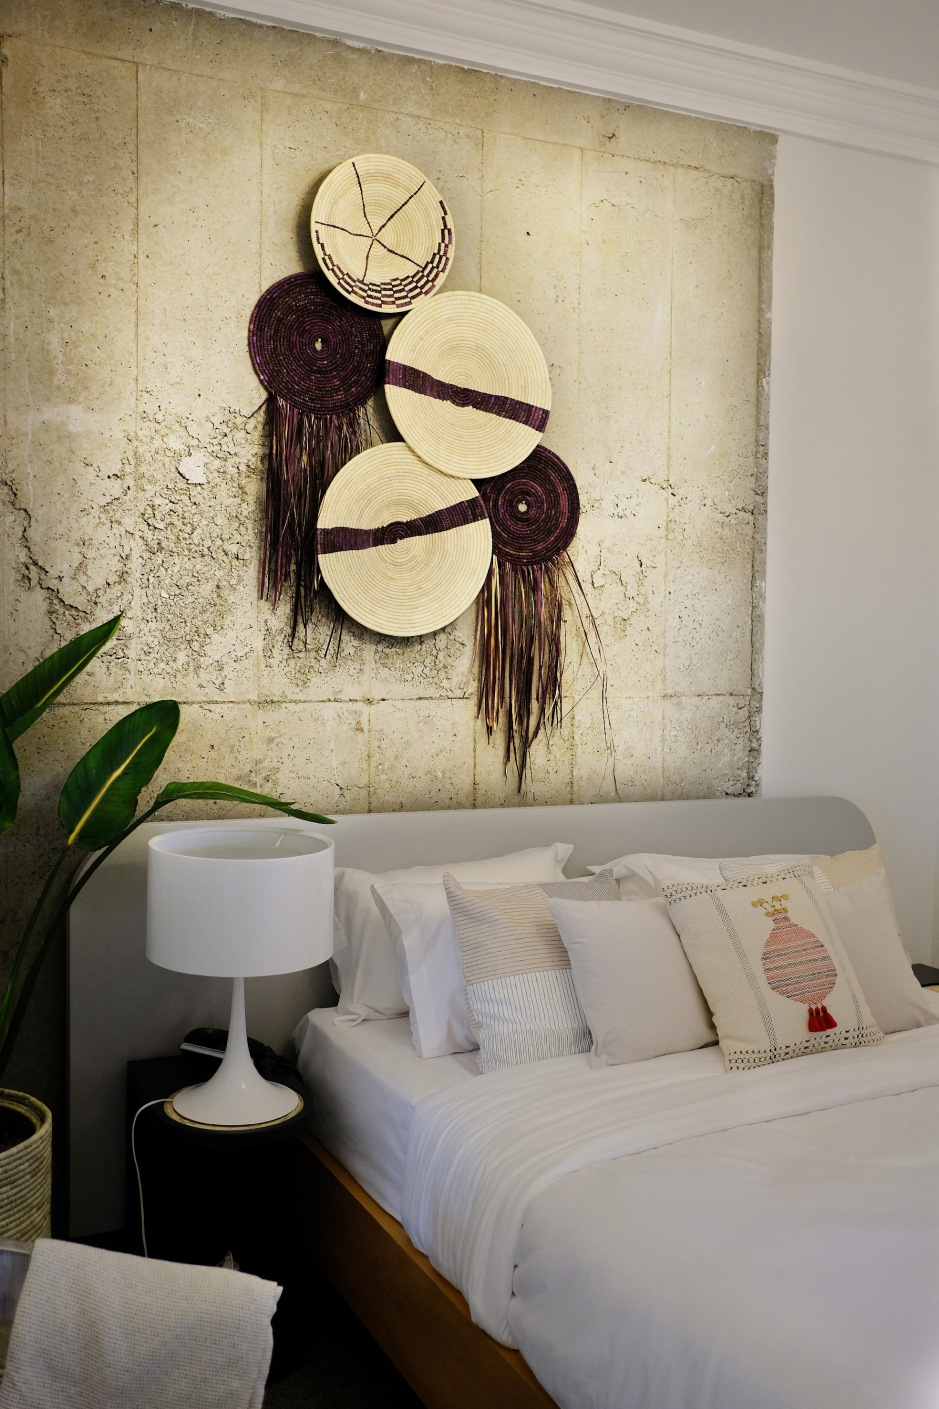 Hotel Hanna - Ojagh room